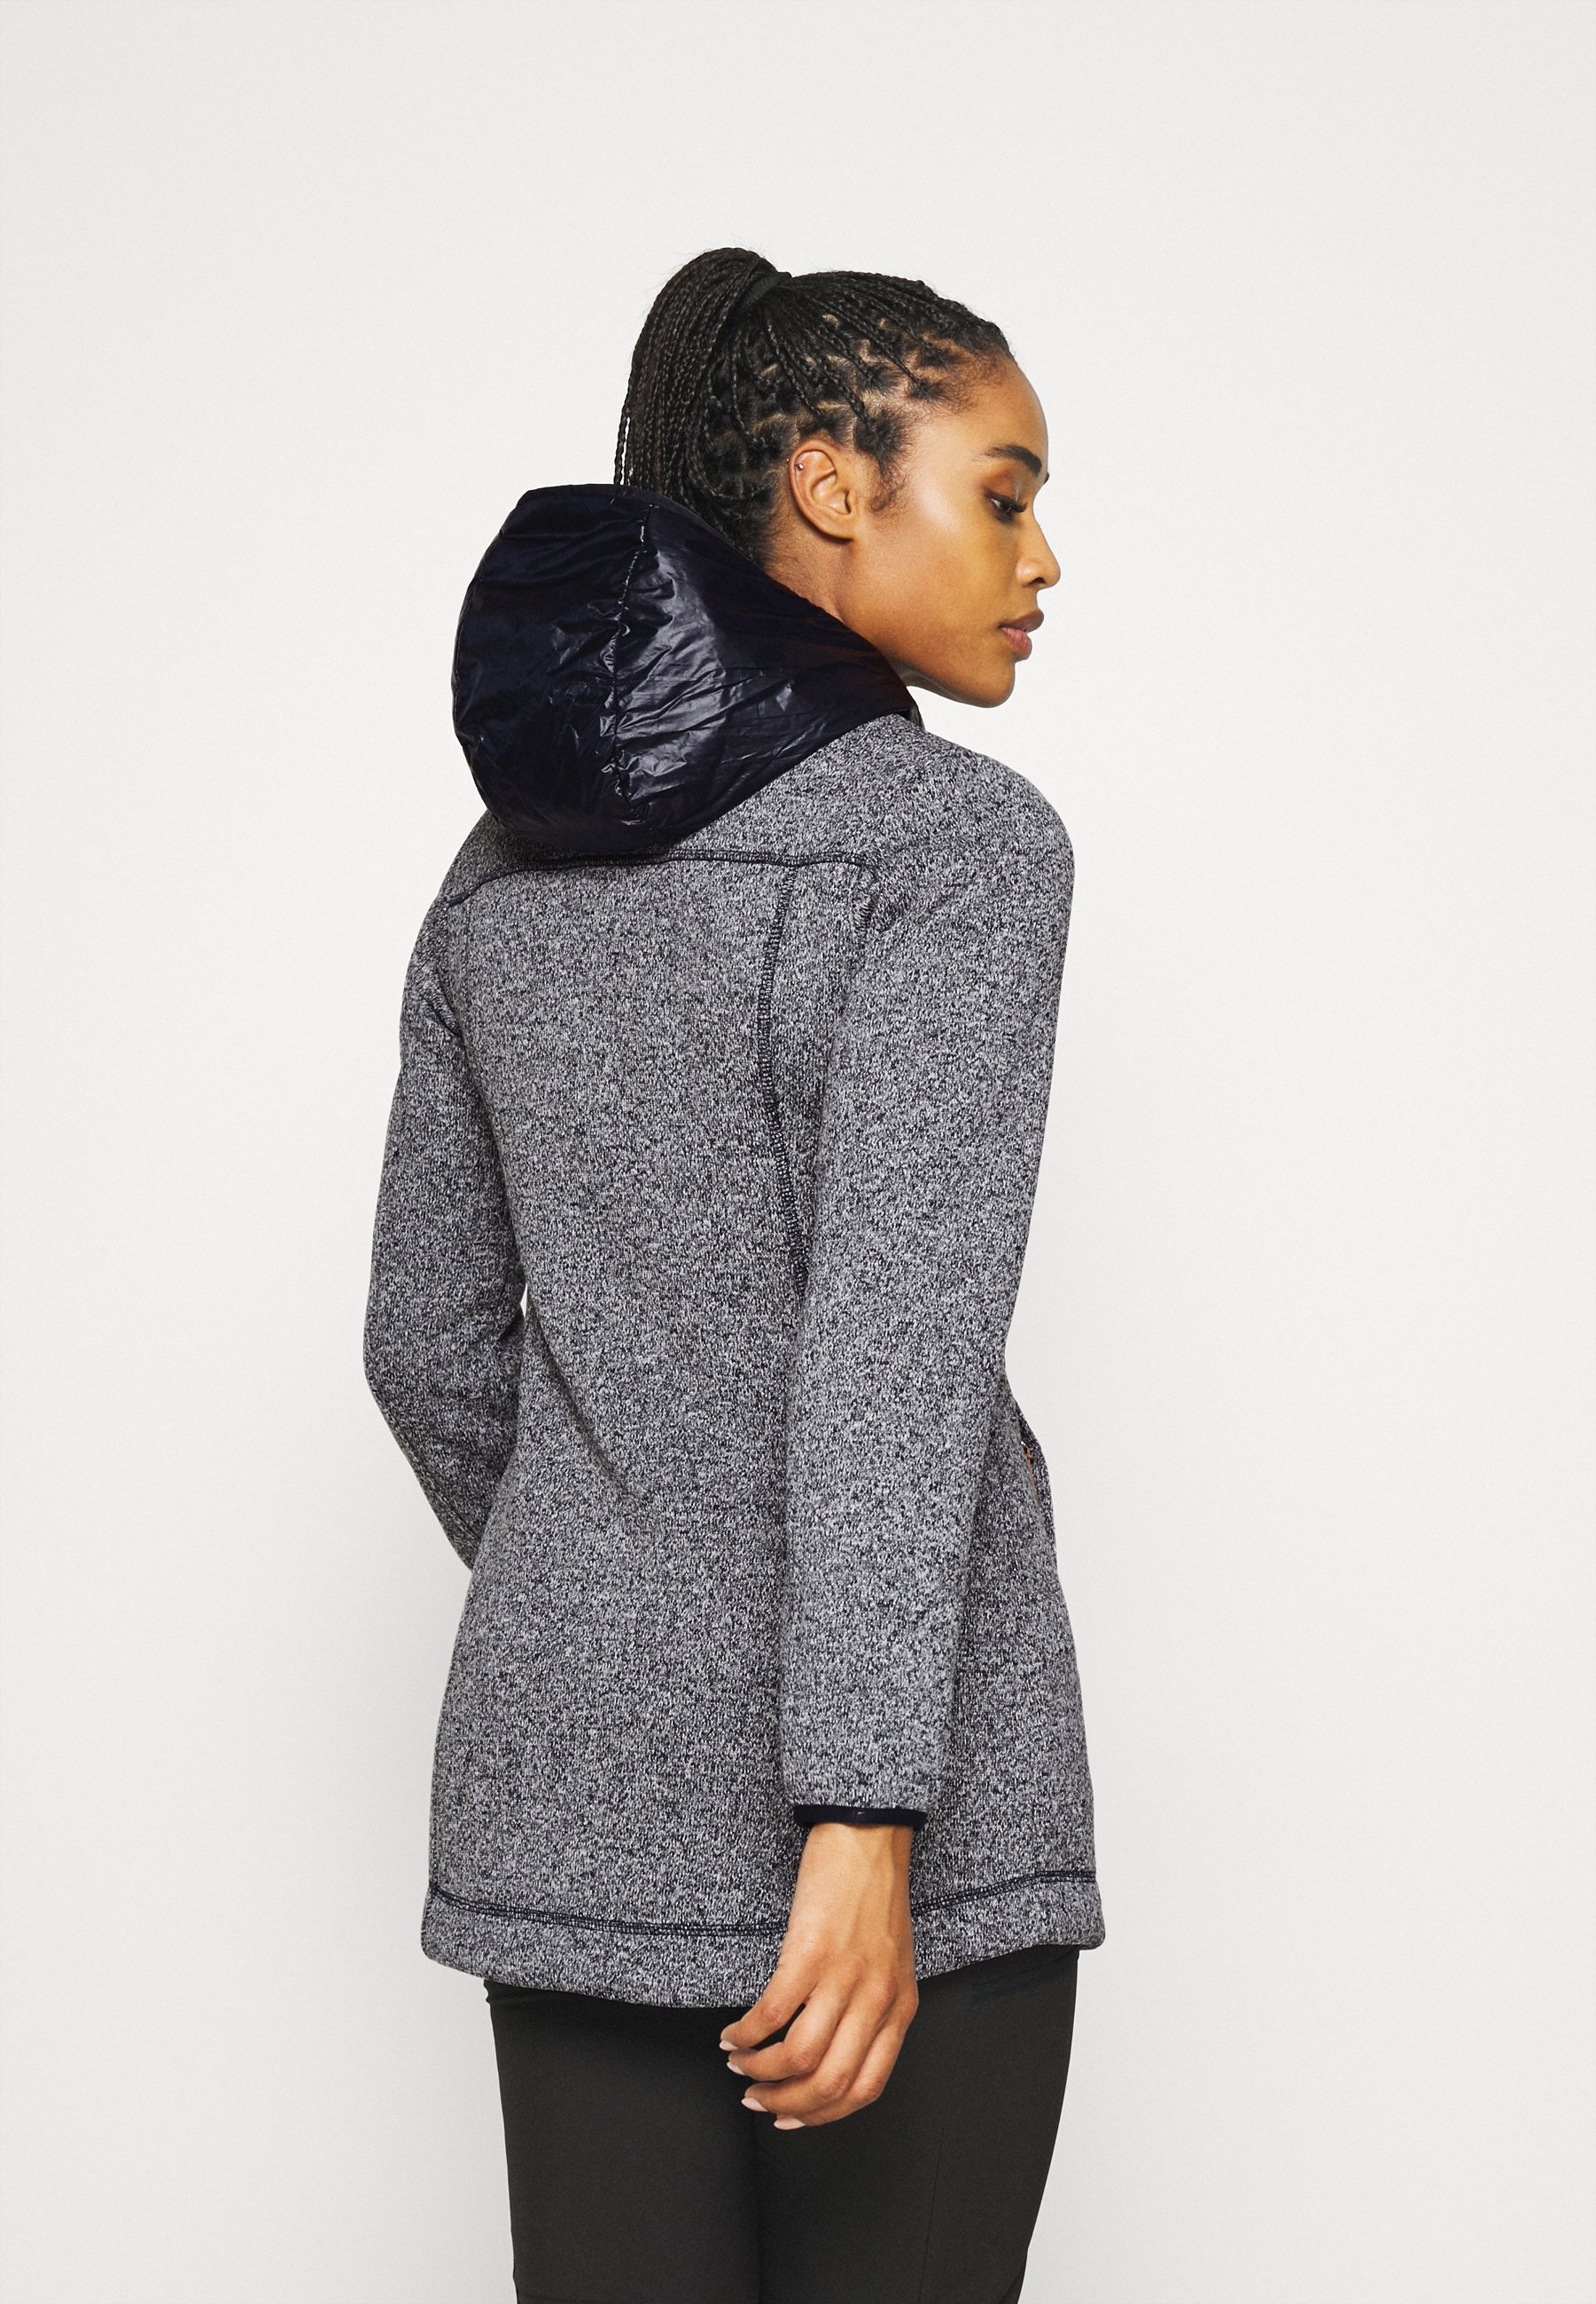 Icepeak ARENDSEE - Fleece jacket - dark blue 1hIY7